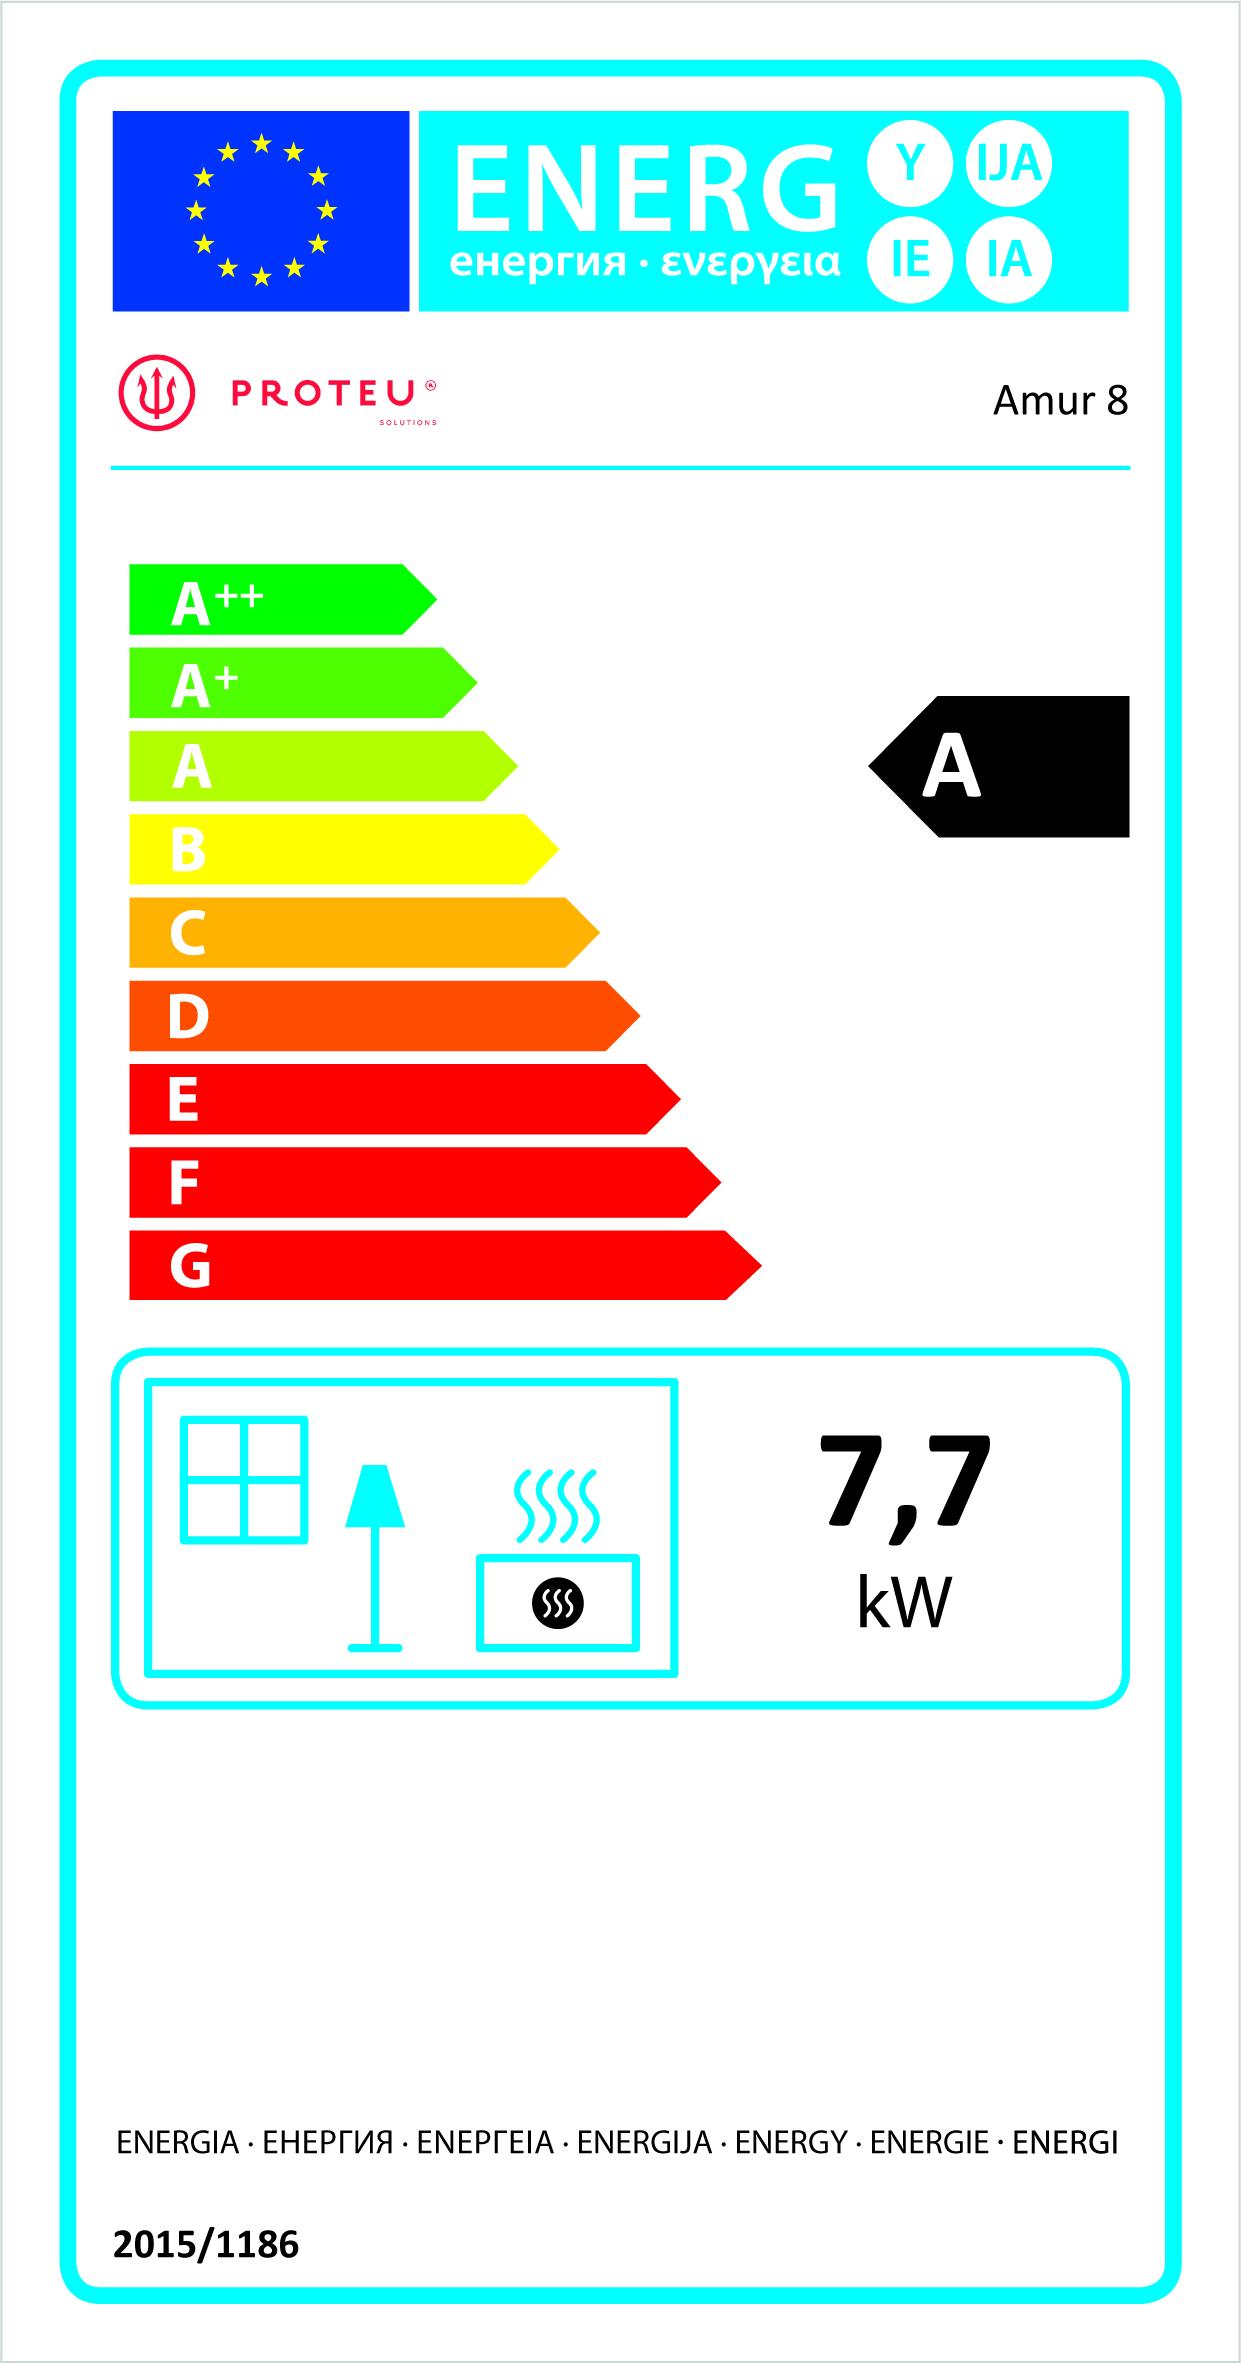 Etiqueta Energética Amur 8